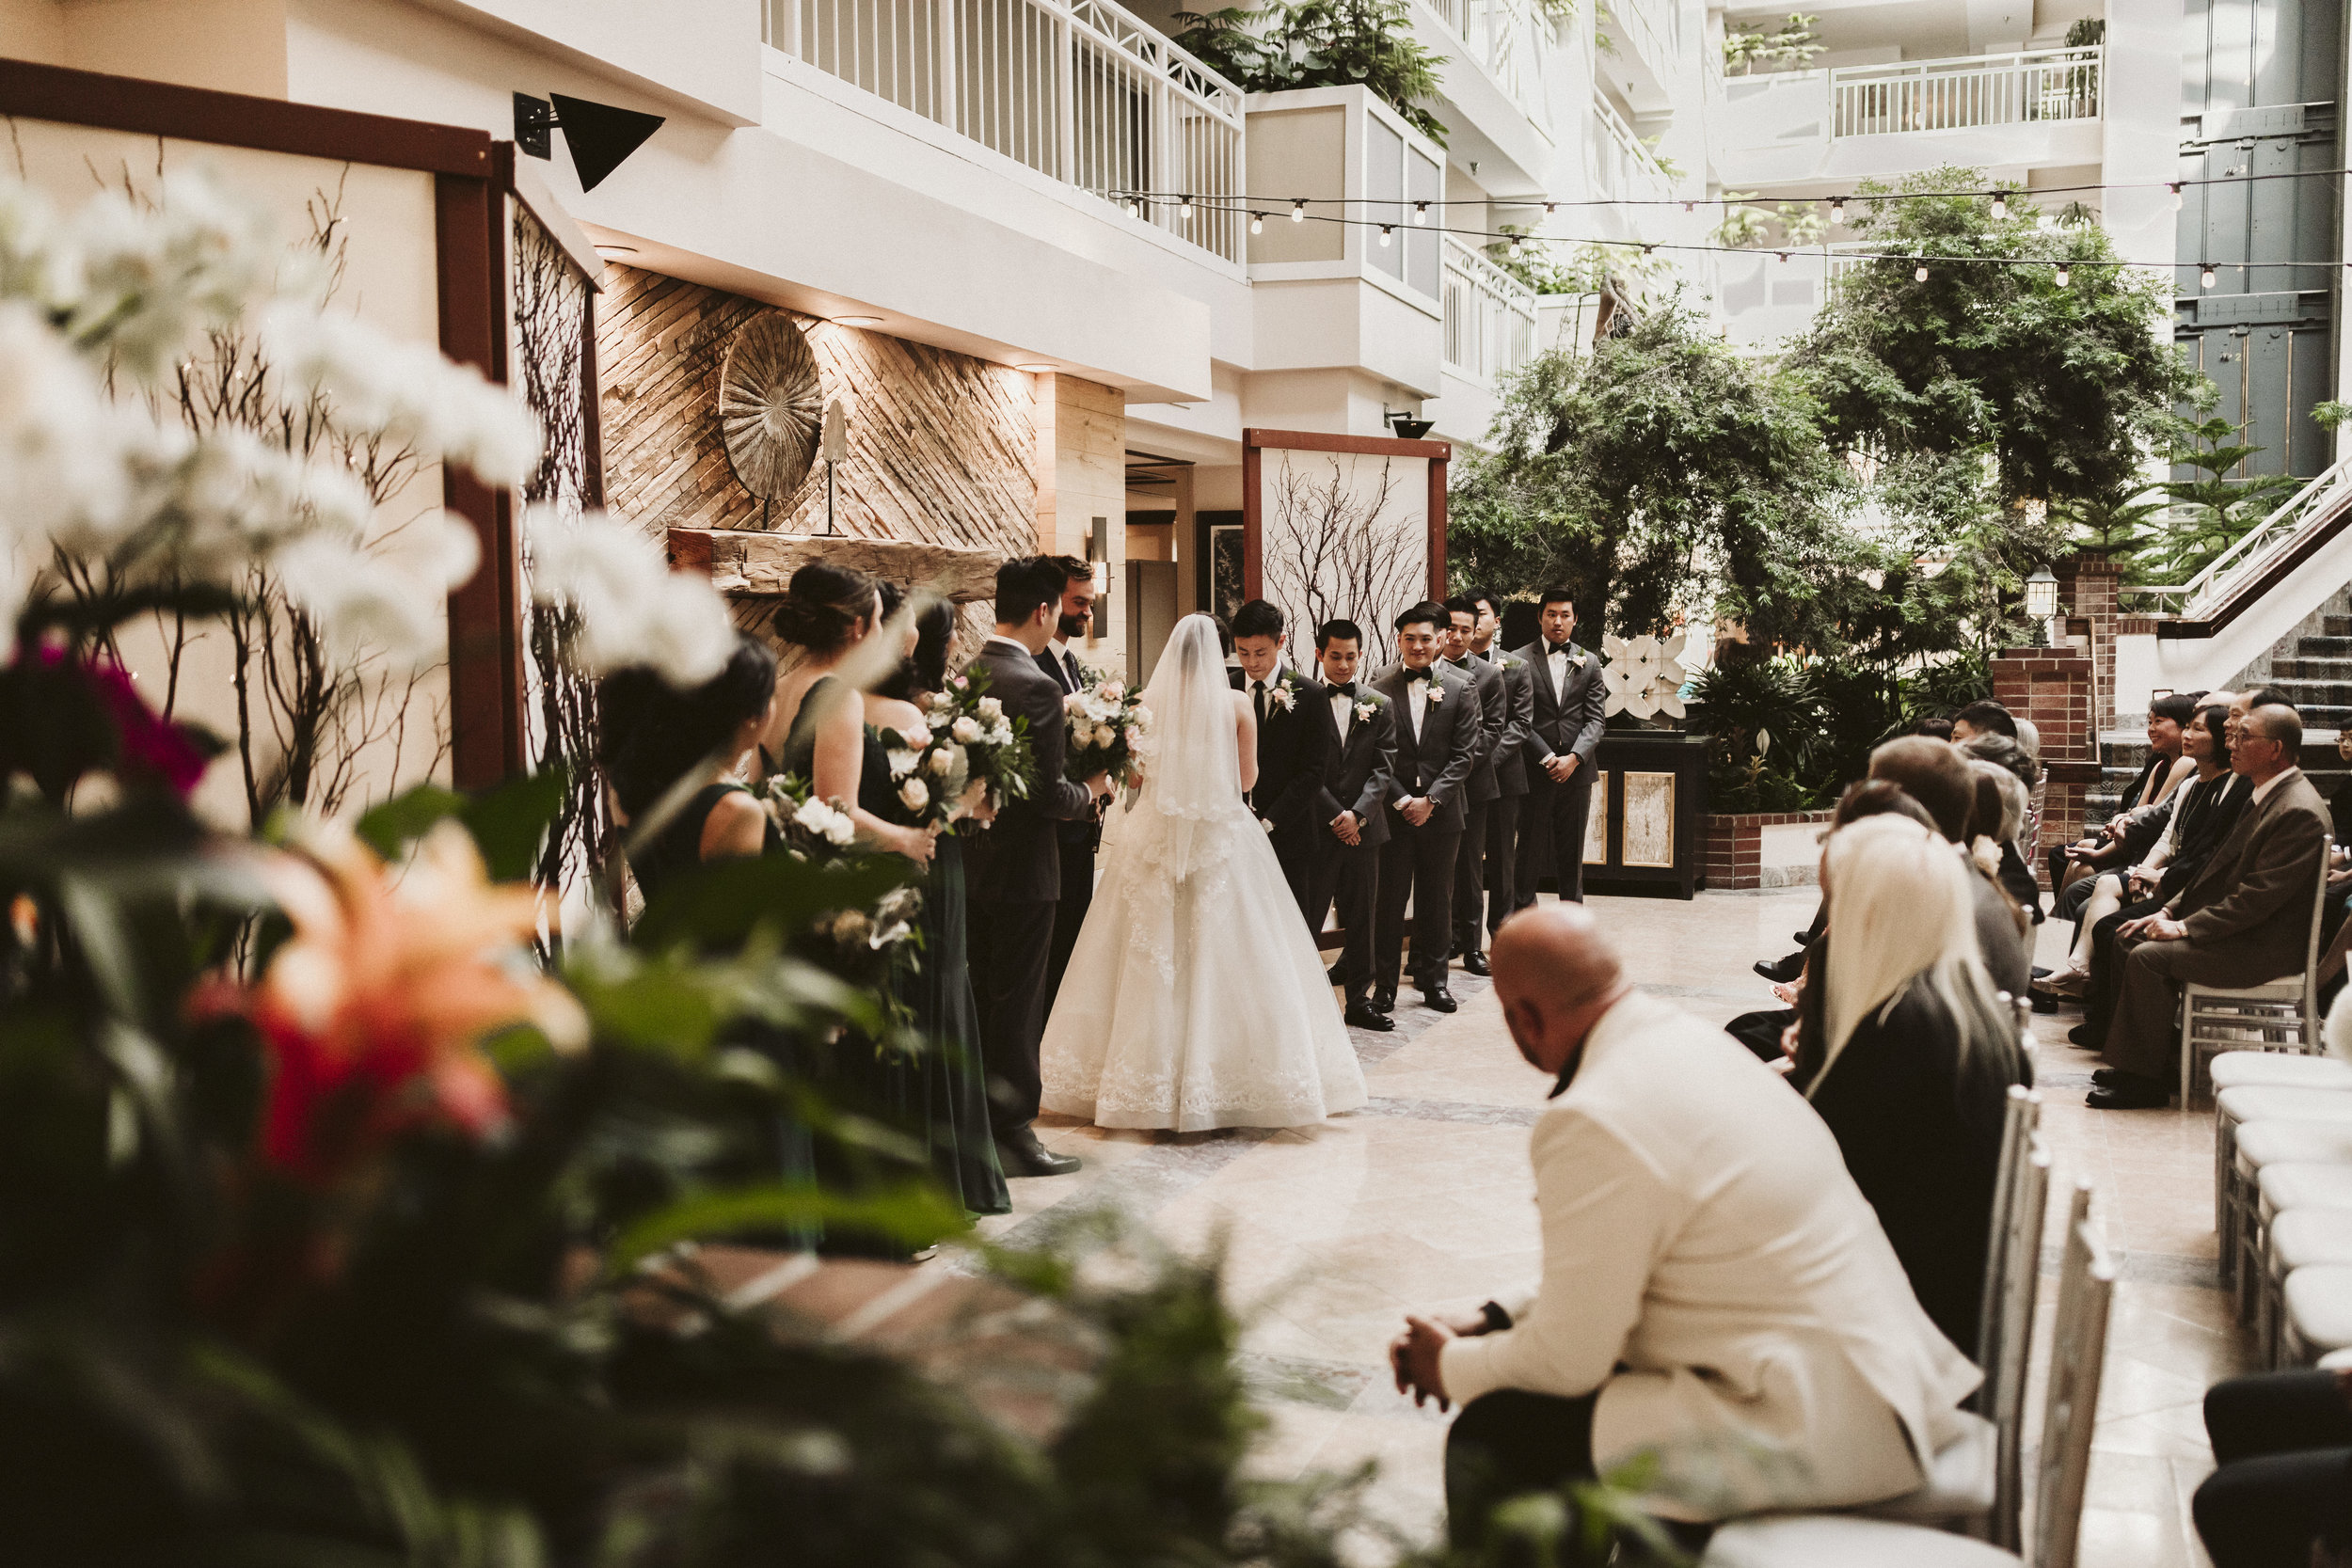 _P8A0383vildphotography-wedding-tahoewedding-laketahoe-Jeena_Hayden.jpg